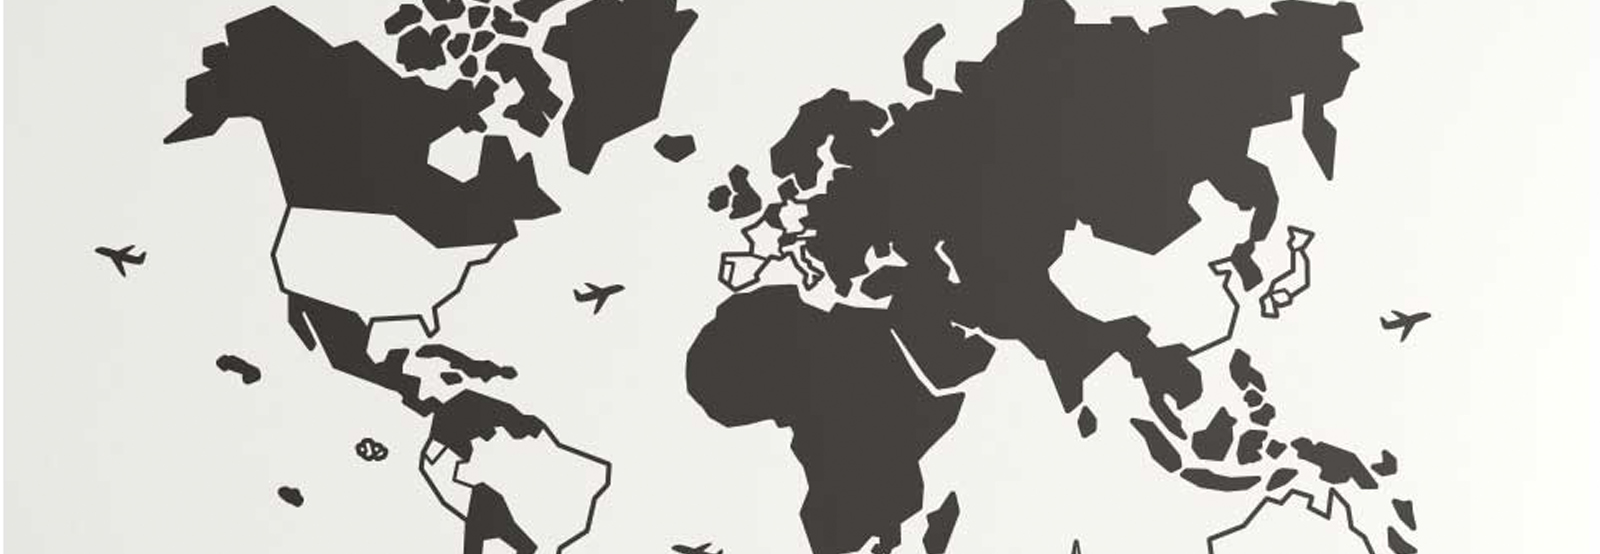 adesivo de países por onde viajou